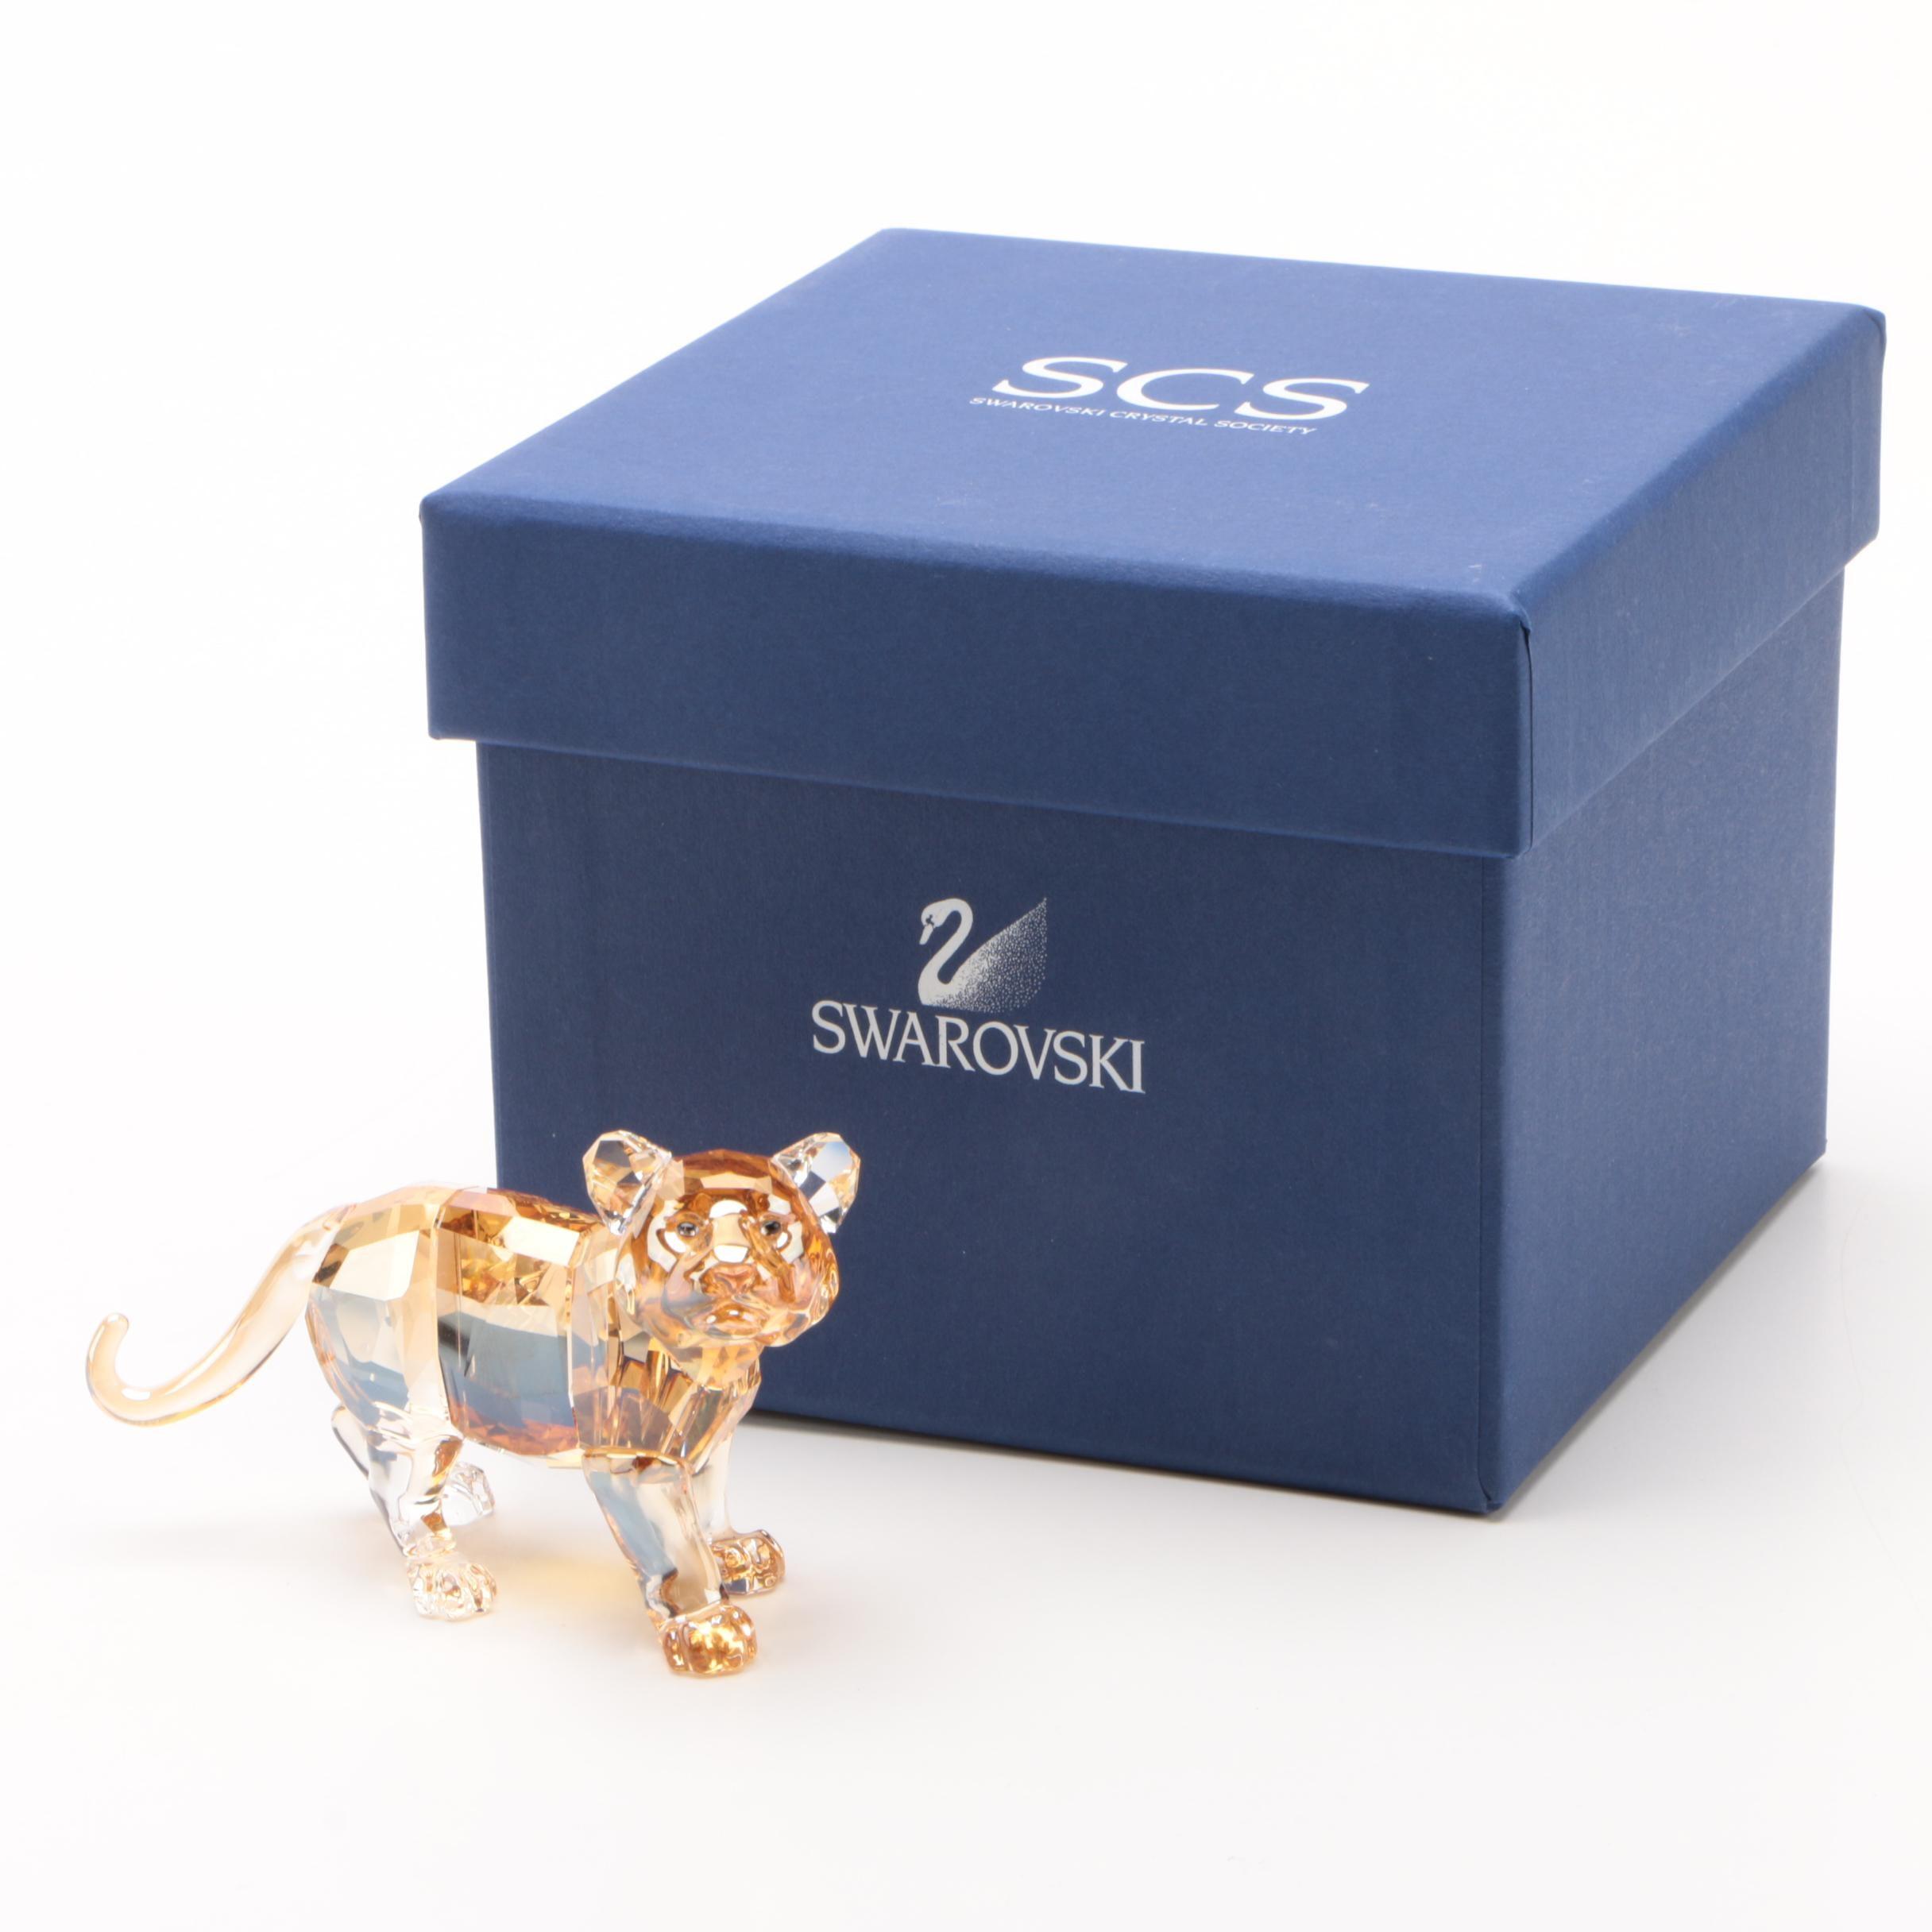 "Swarovski Endangered Wildlife ""Tiger Cub Standing"" Crystal Figurine, 2010"